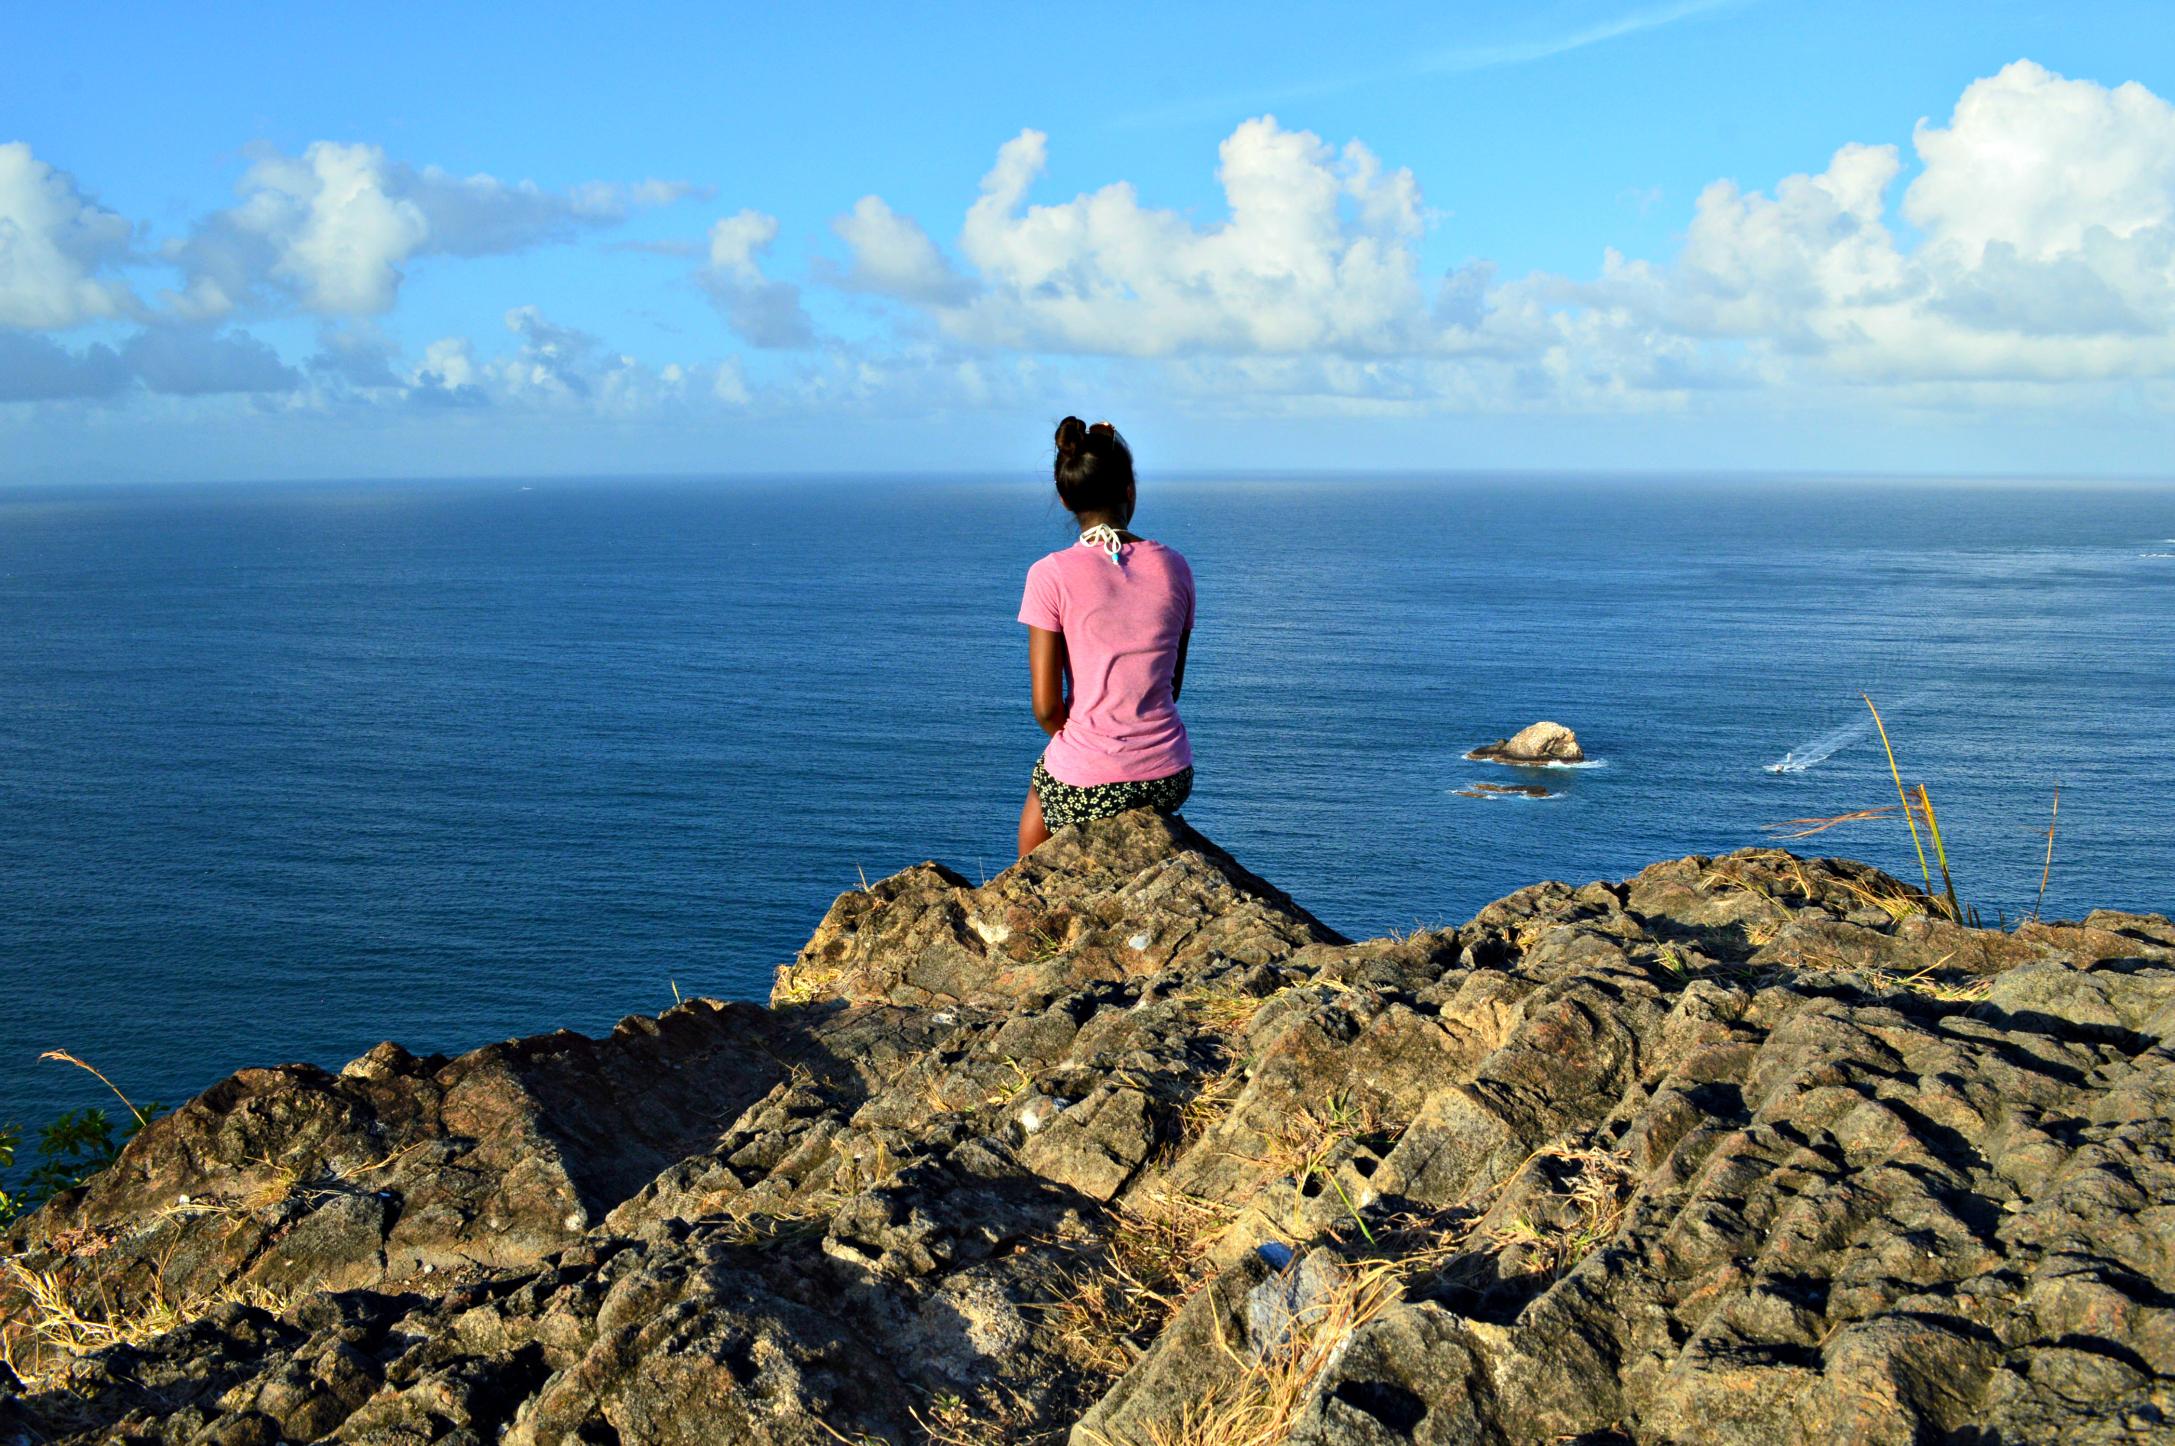 4 Things I Wish I Knew Before I Went to Saint Lucia - One Girl One World